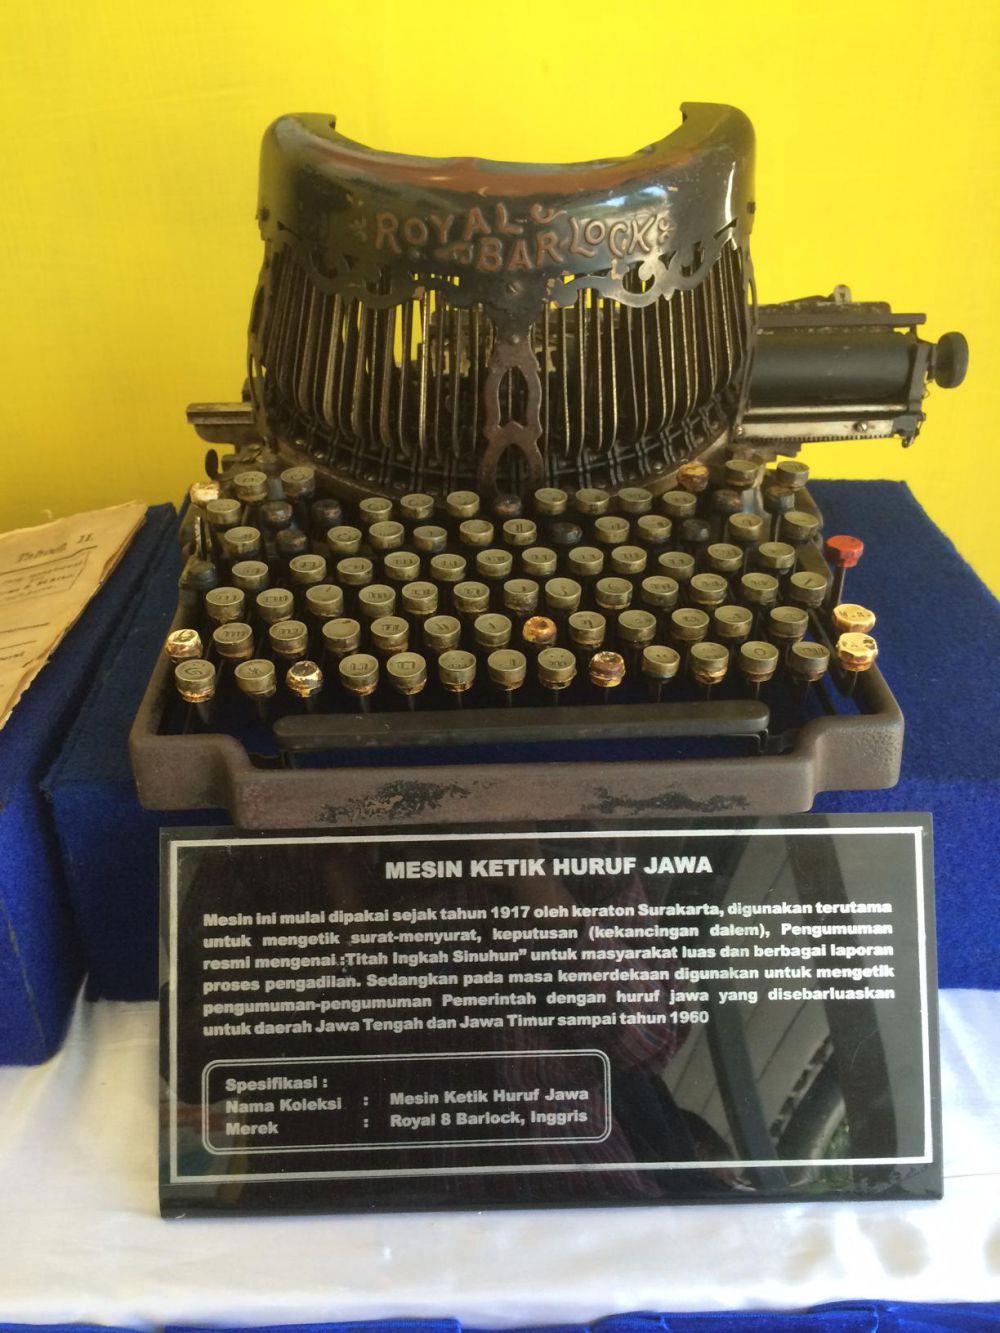 Ternyata dulu pernah ada mesin ketik huruf Jawa, begini bentuknya!